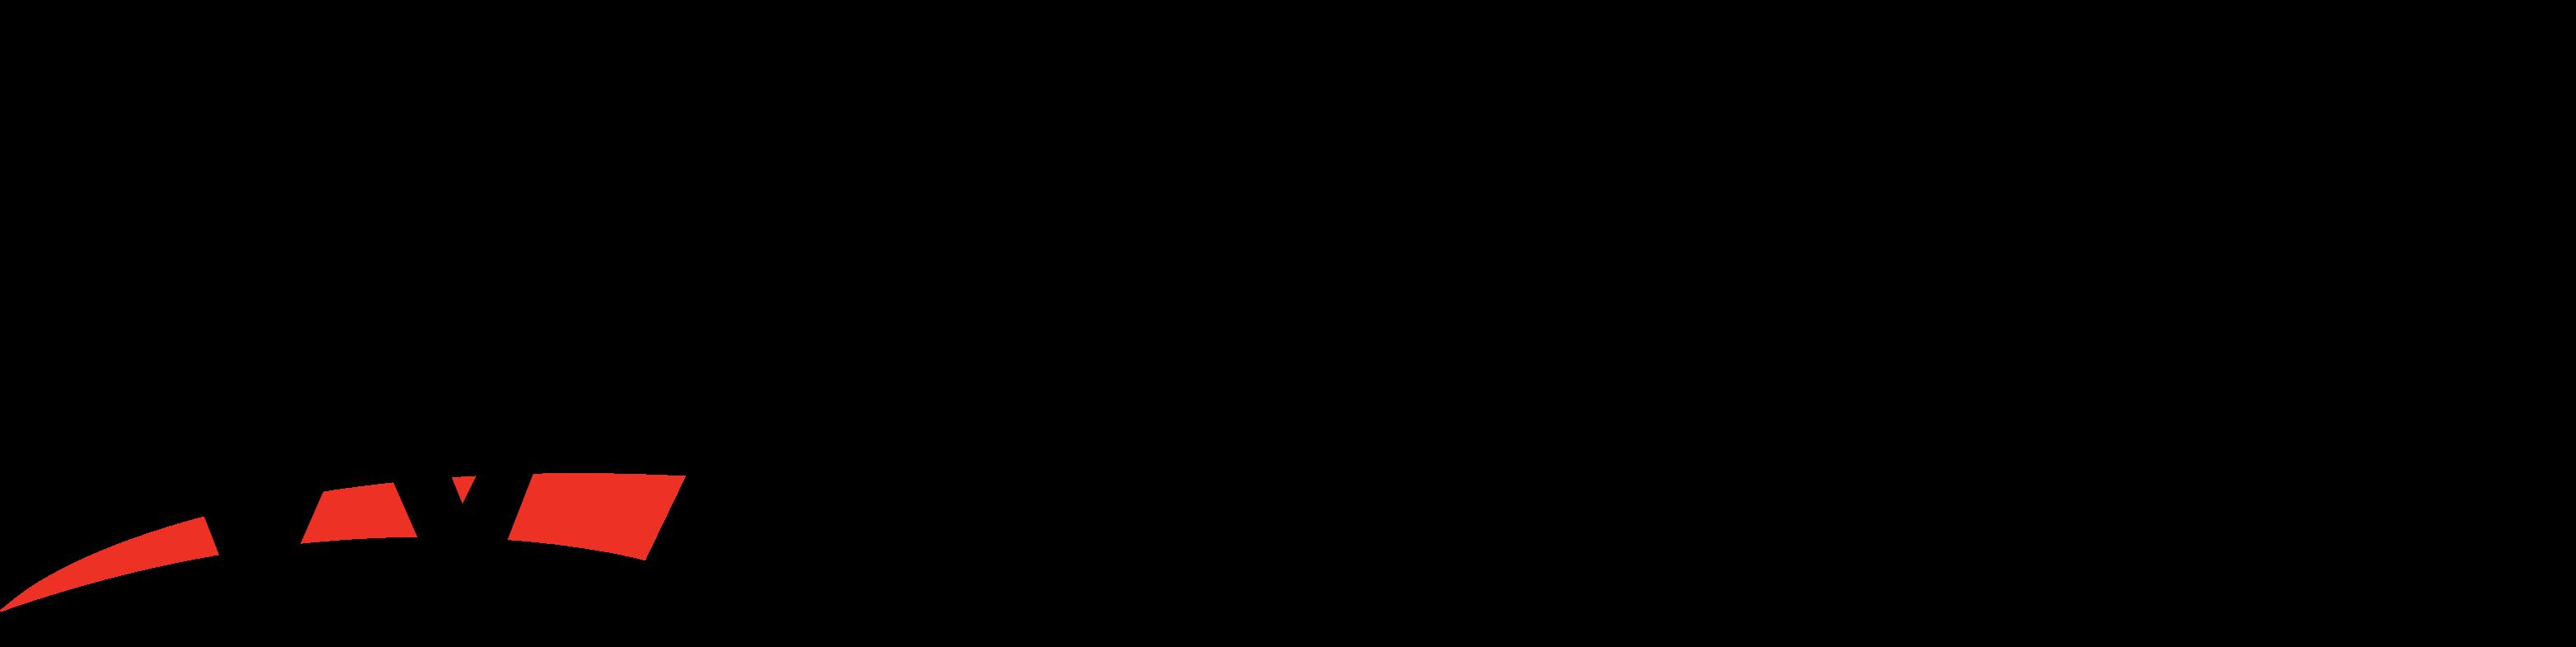 نتورک دبلیو دبلیو ای | دانلود کشتی کج